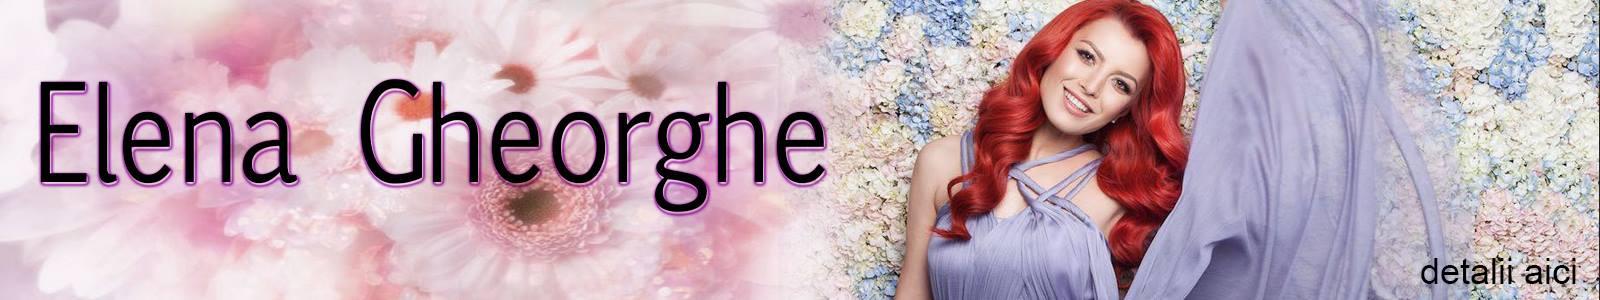 contact-elena-gheorghe-pret-nunta-organizare-evenimente